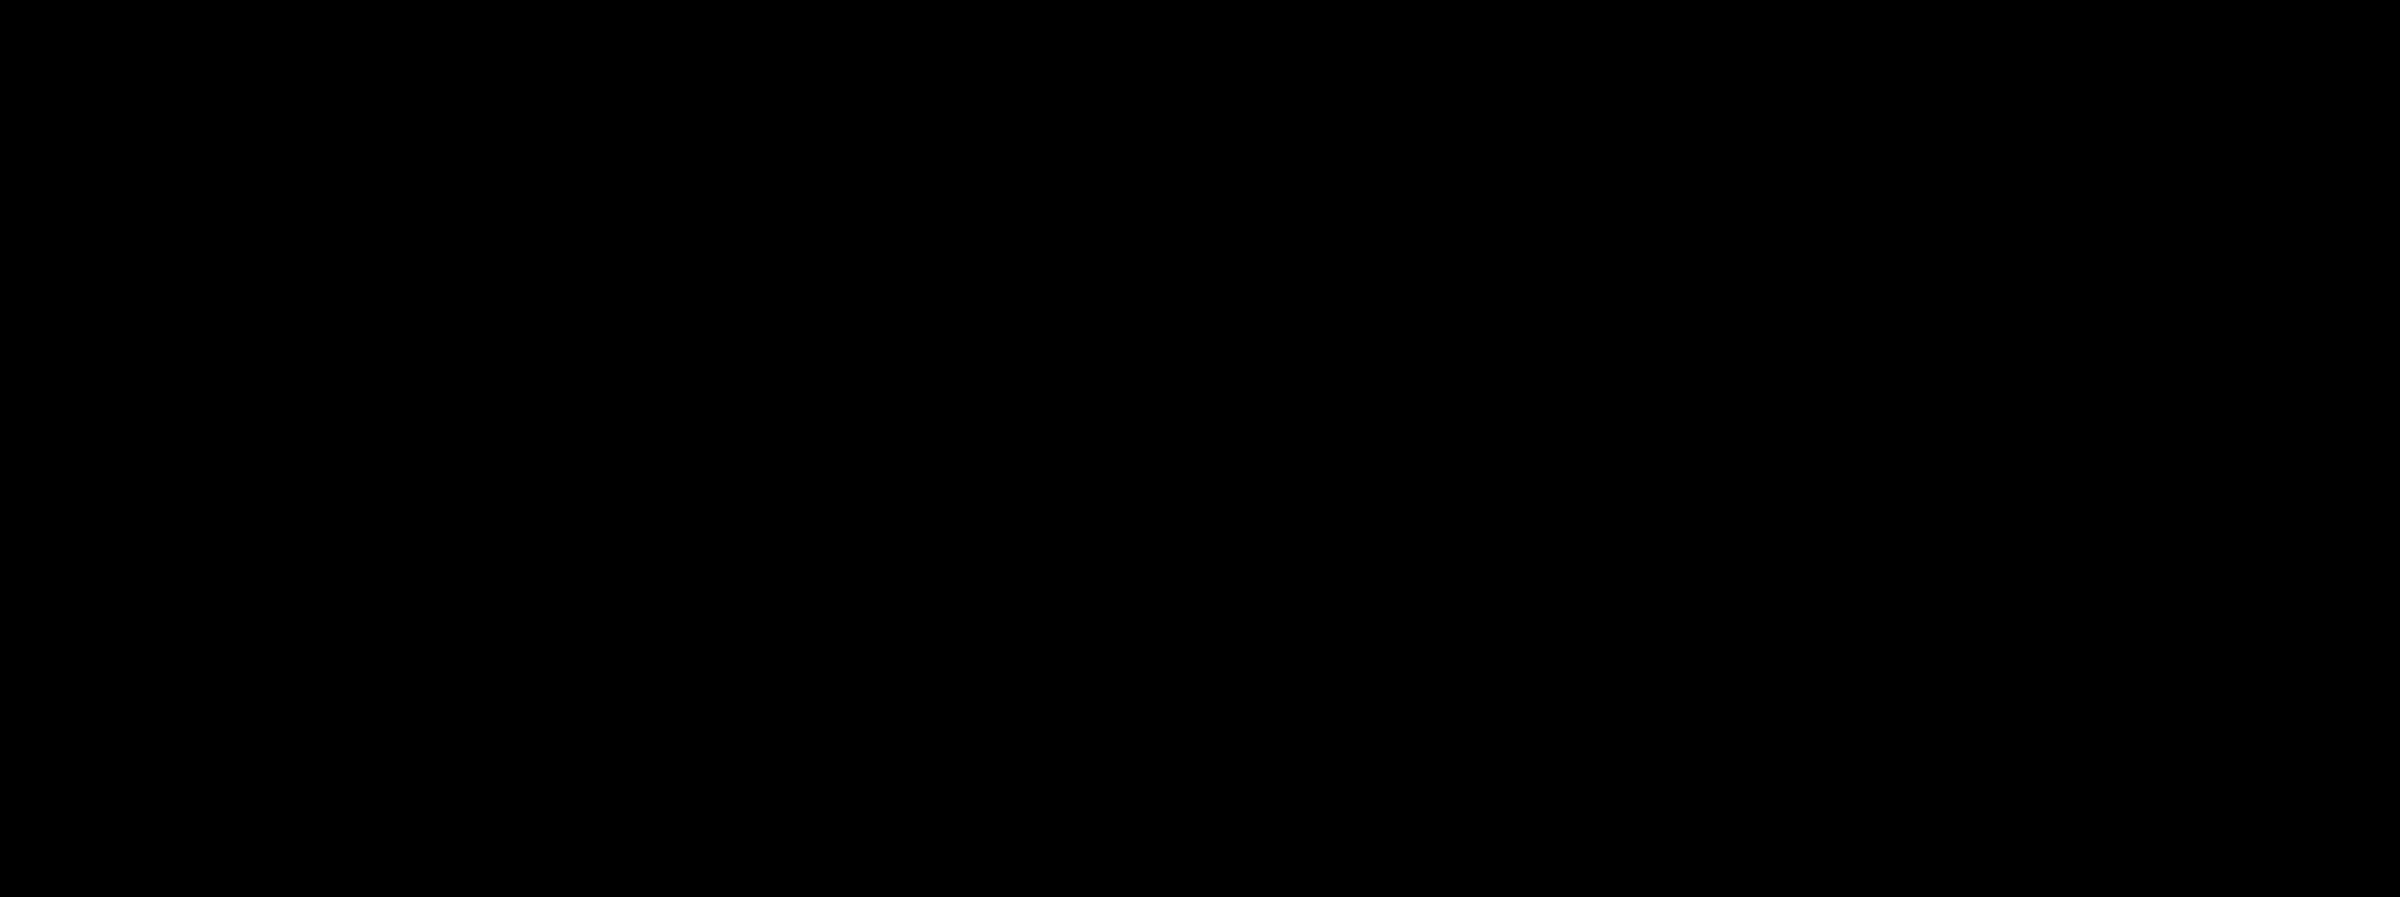 2400x897 Clipart